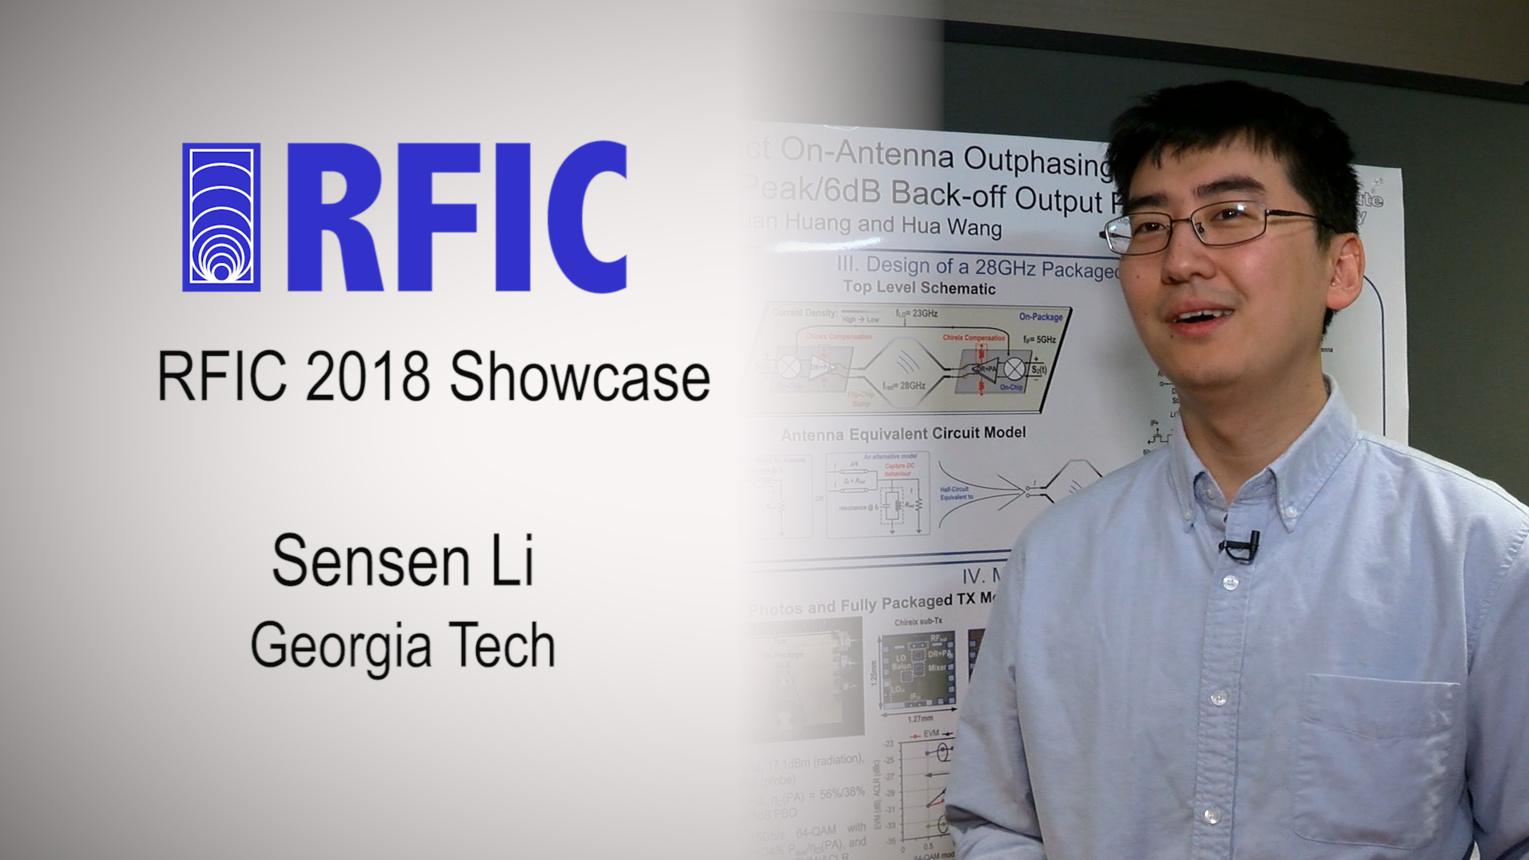 28GHz Packaged Chireix Transmitter - Sensen Li - RFIC Showcase 2018